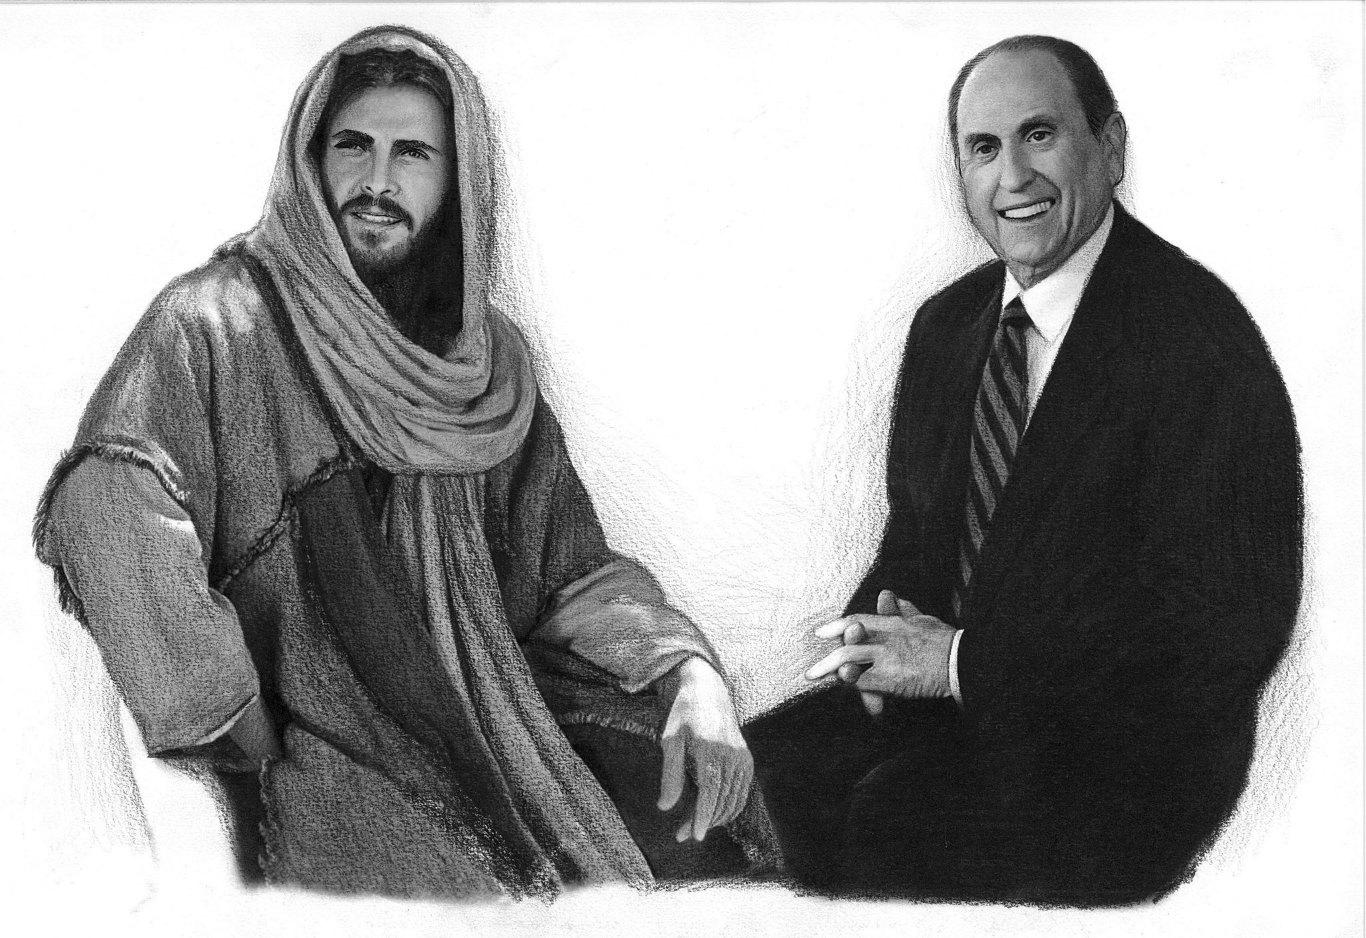 Jesucristo y Thomas S. Monson por Melvin lans